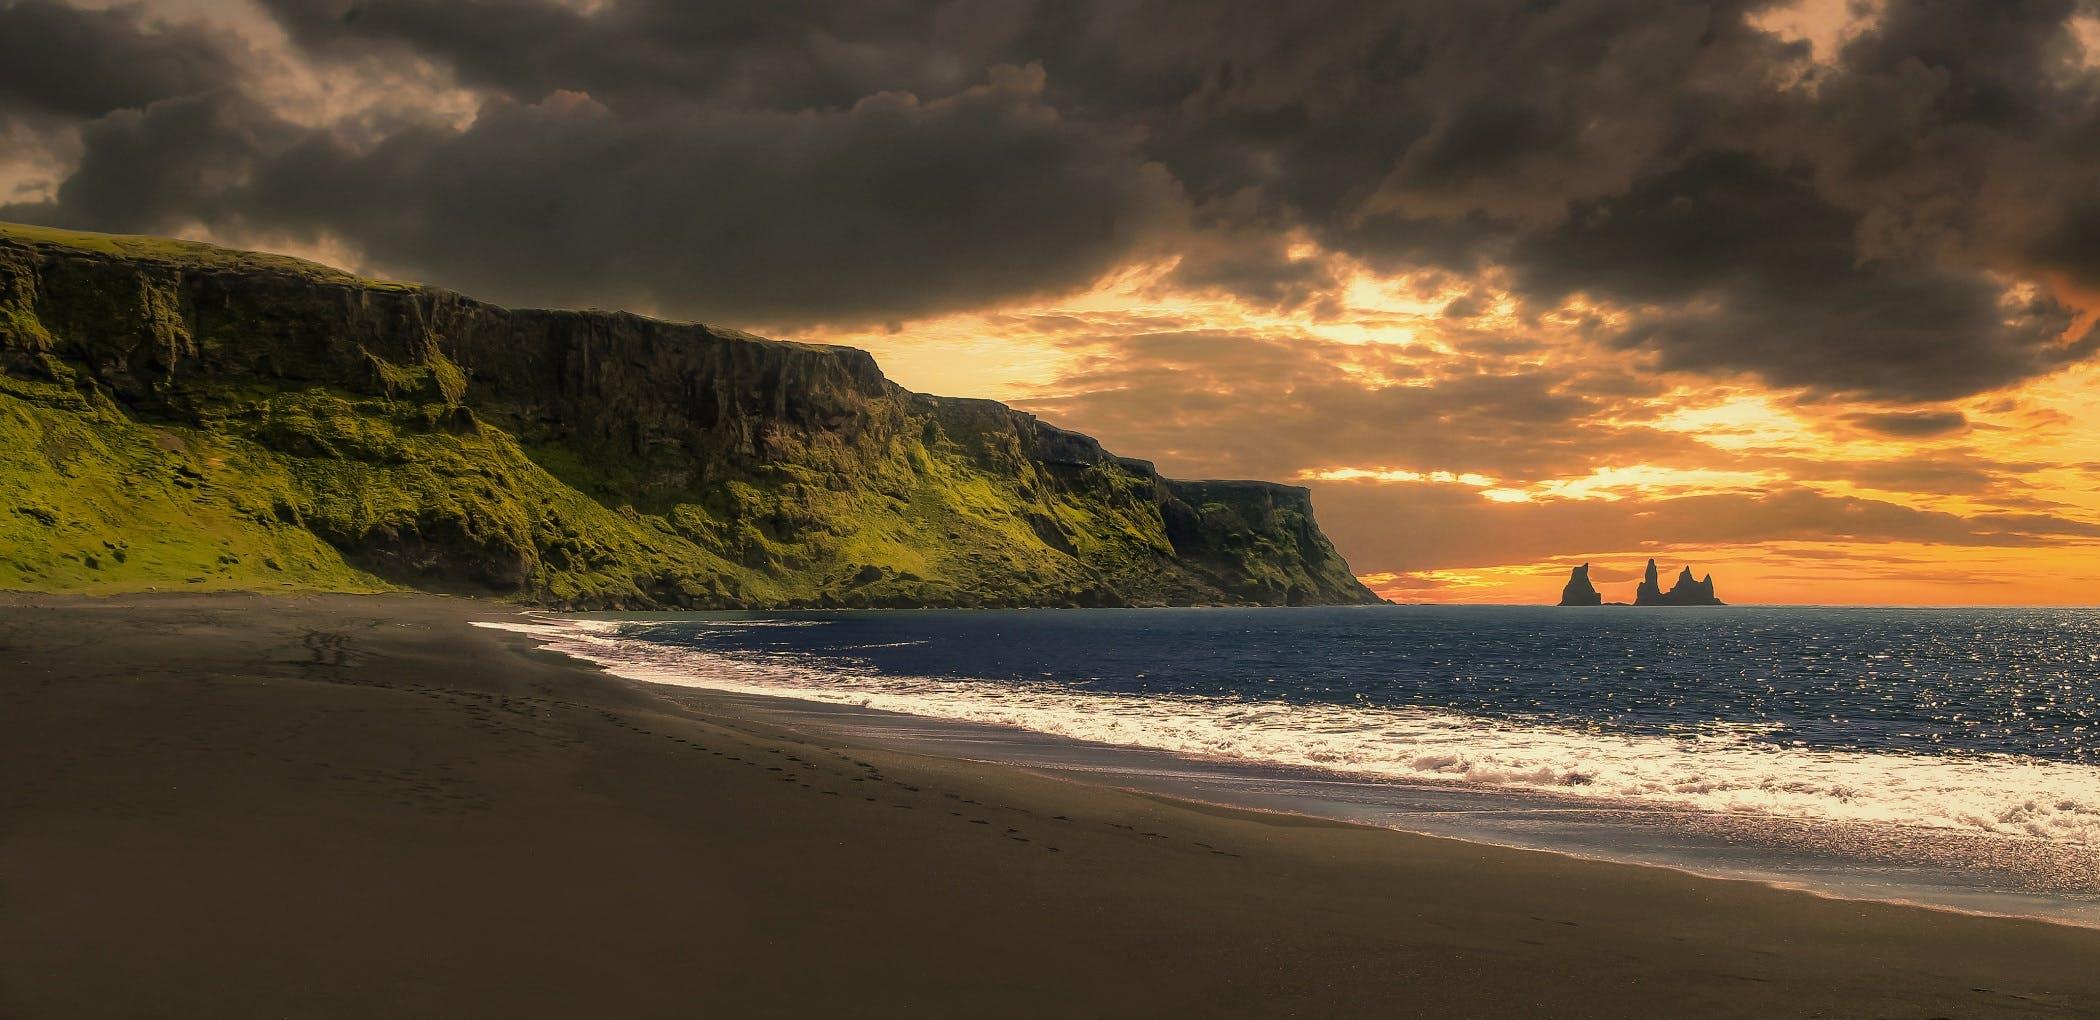 Free stock photo of beach, Black Beach, clouds, dark beach